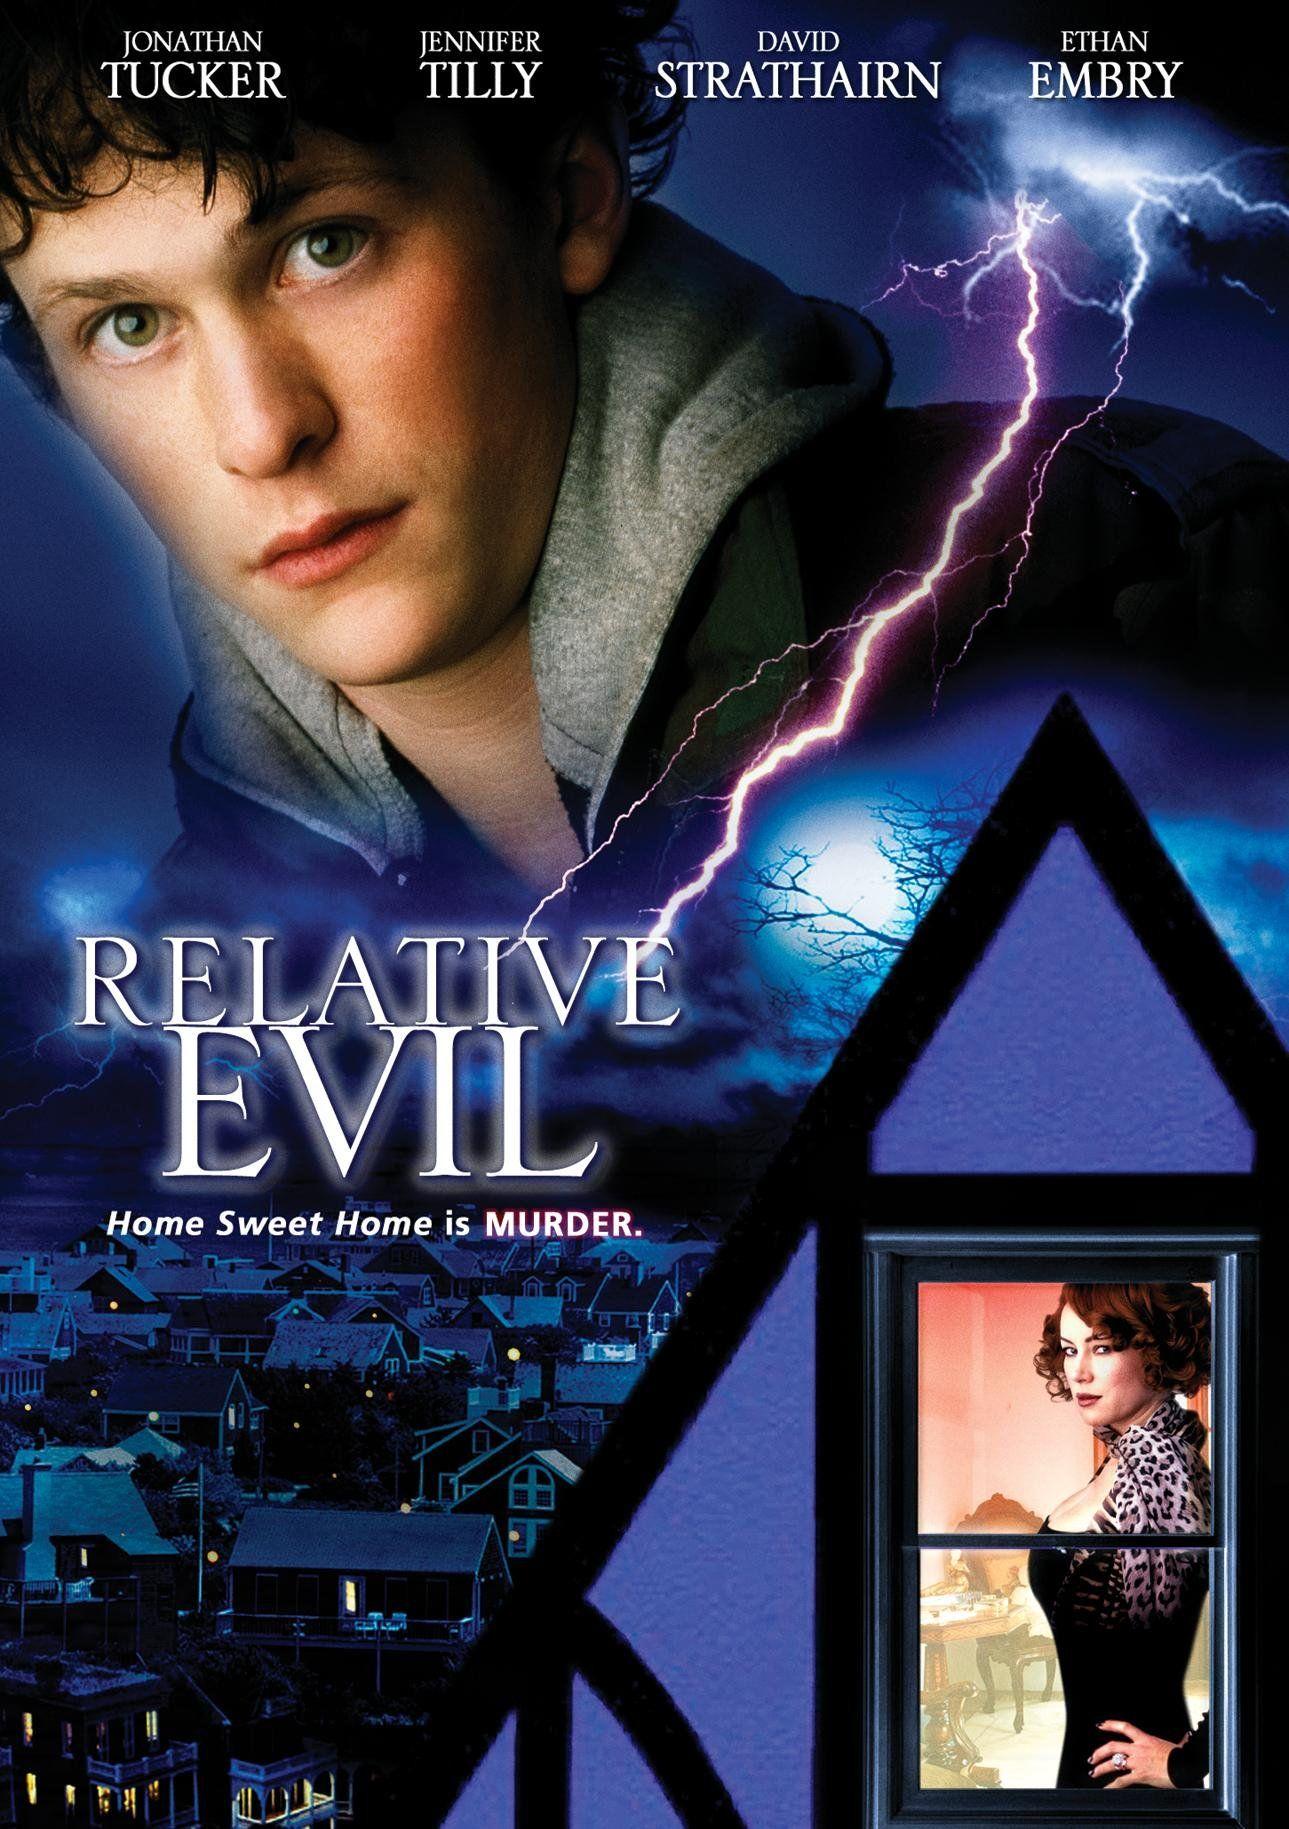 """Relative Evil"" DVD Artwork, 2002. Plot: A Troubled 17"